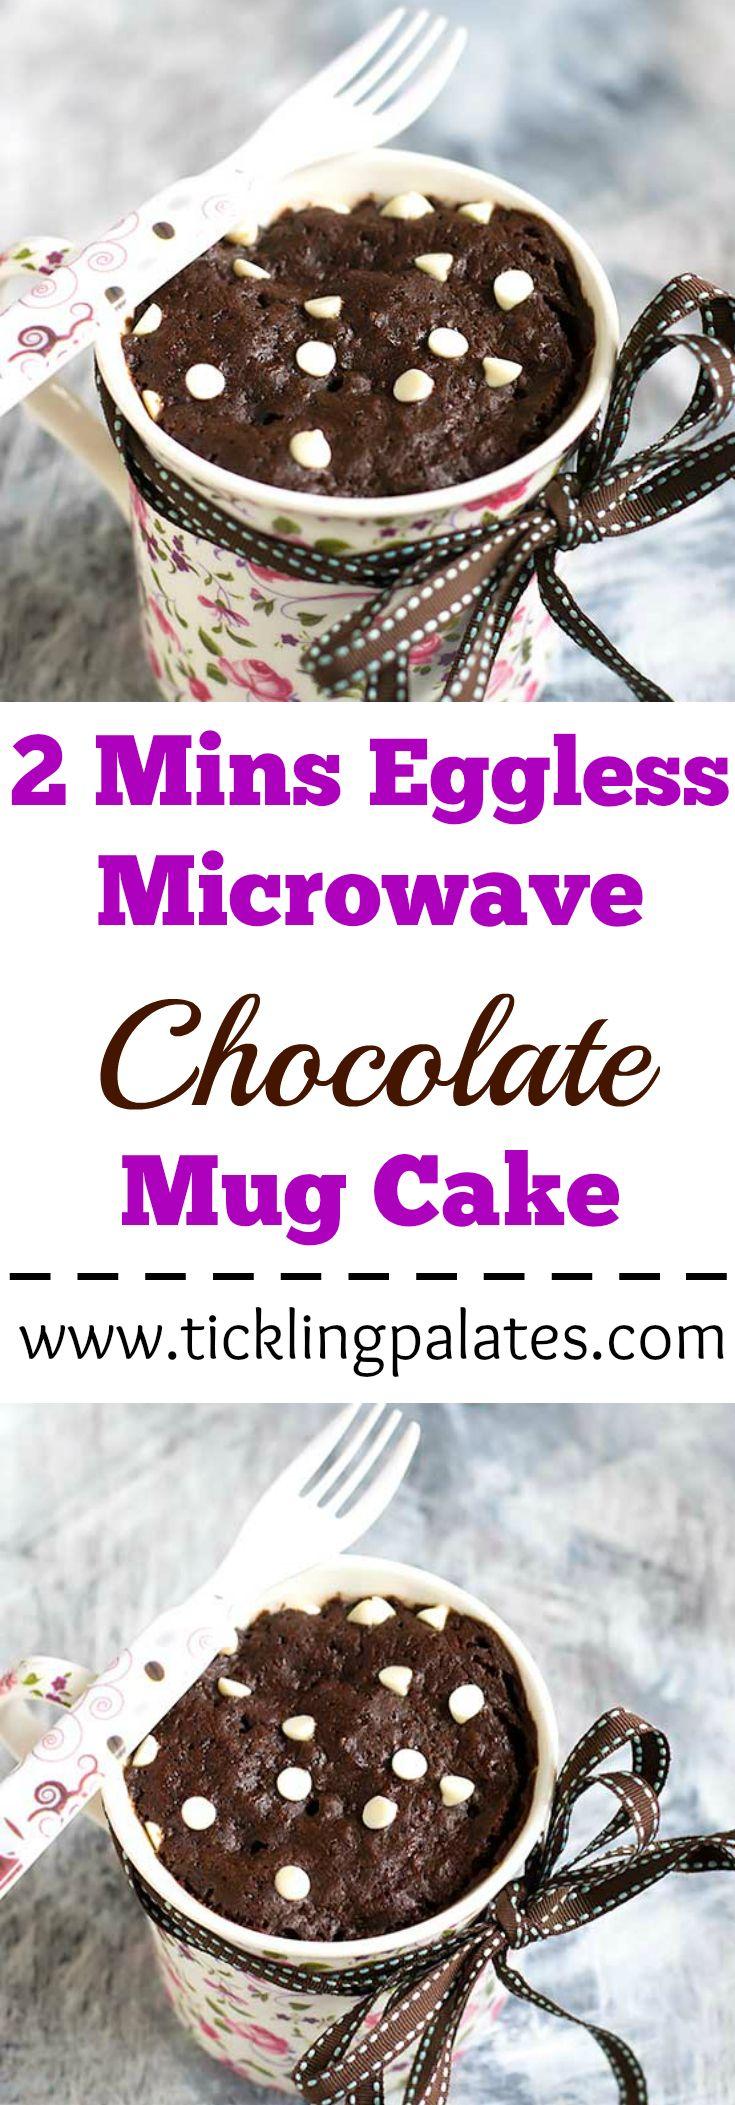 2 mins eggless microwave chocolate mug cake microwave